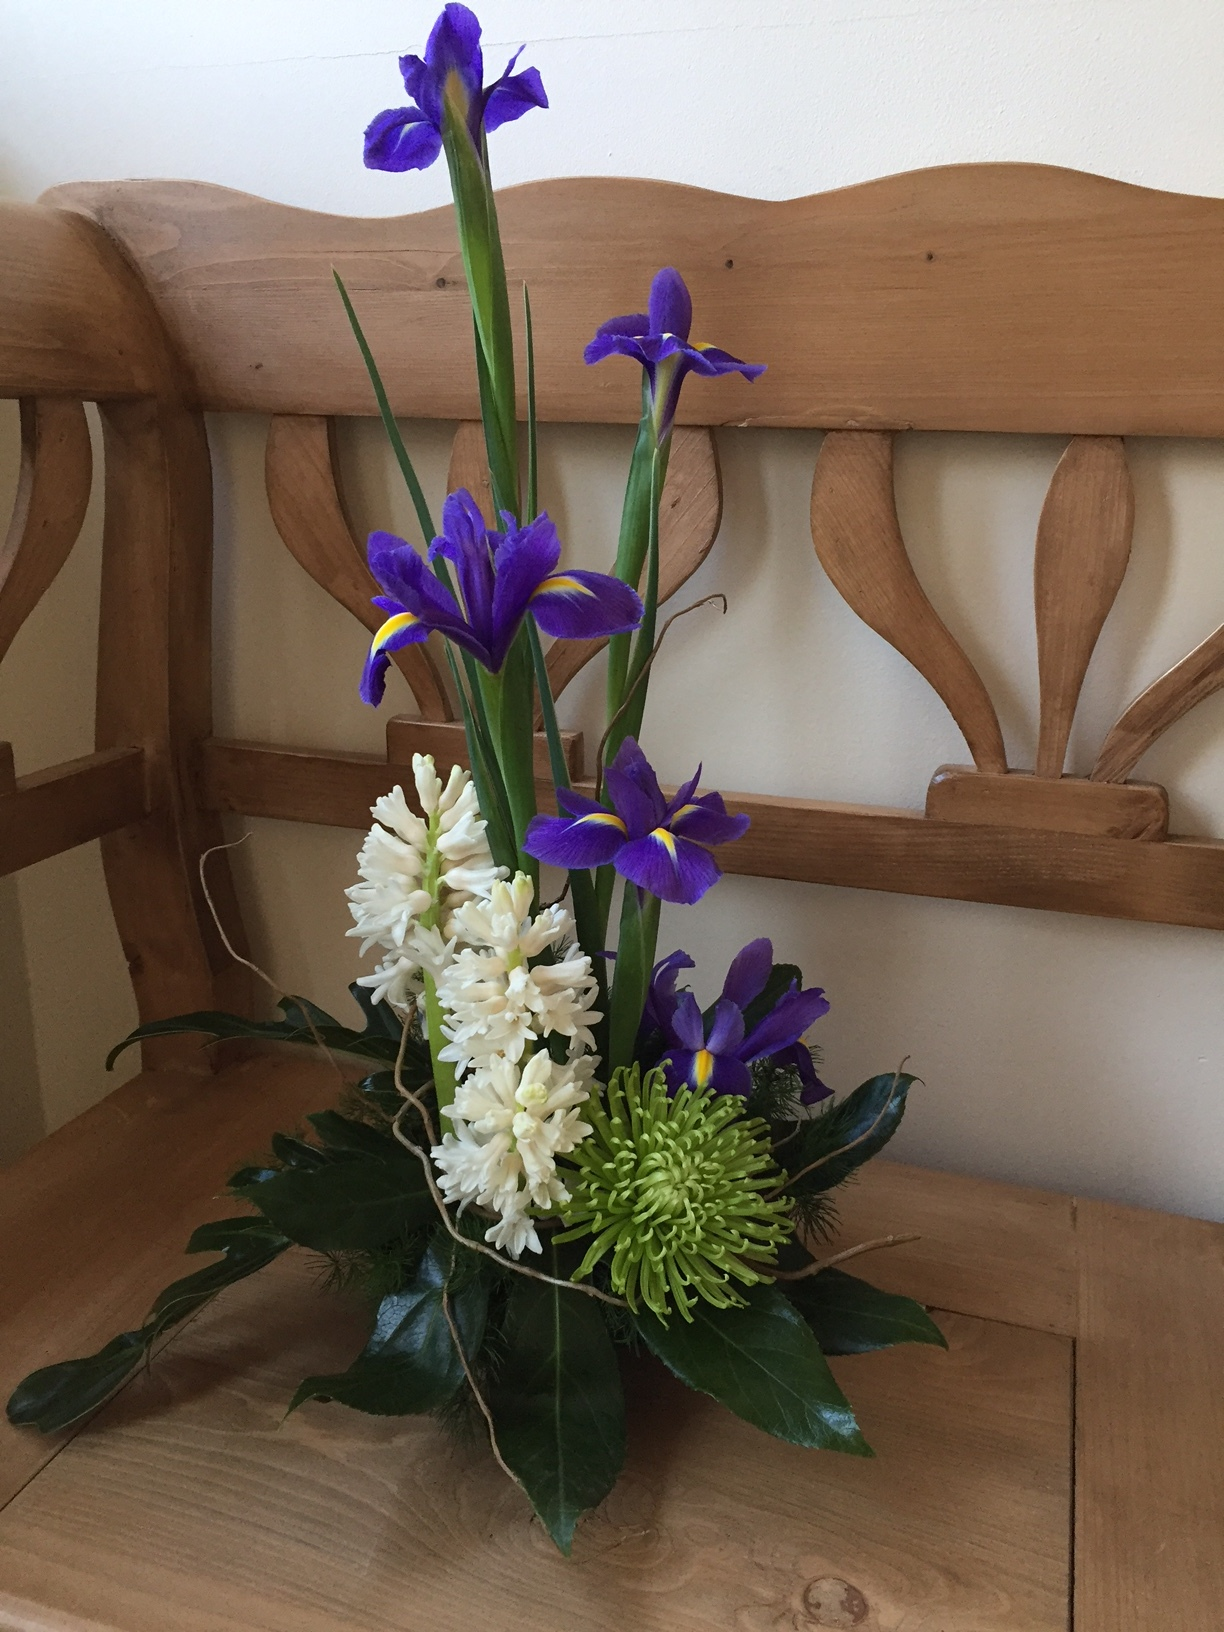 ARRANGEMENT IN OASIS Fragrant flowers in oasis